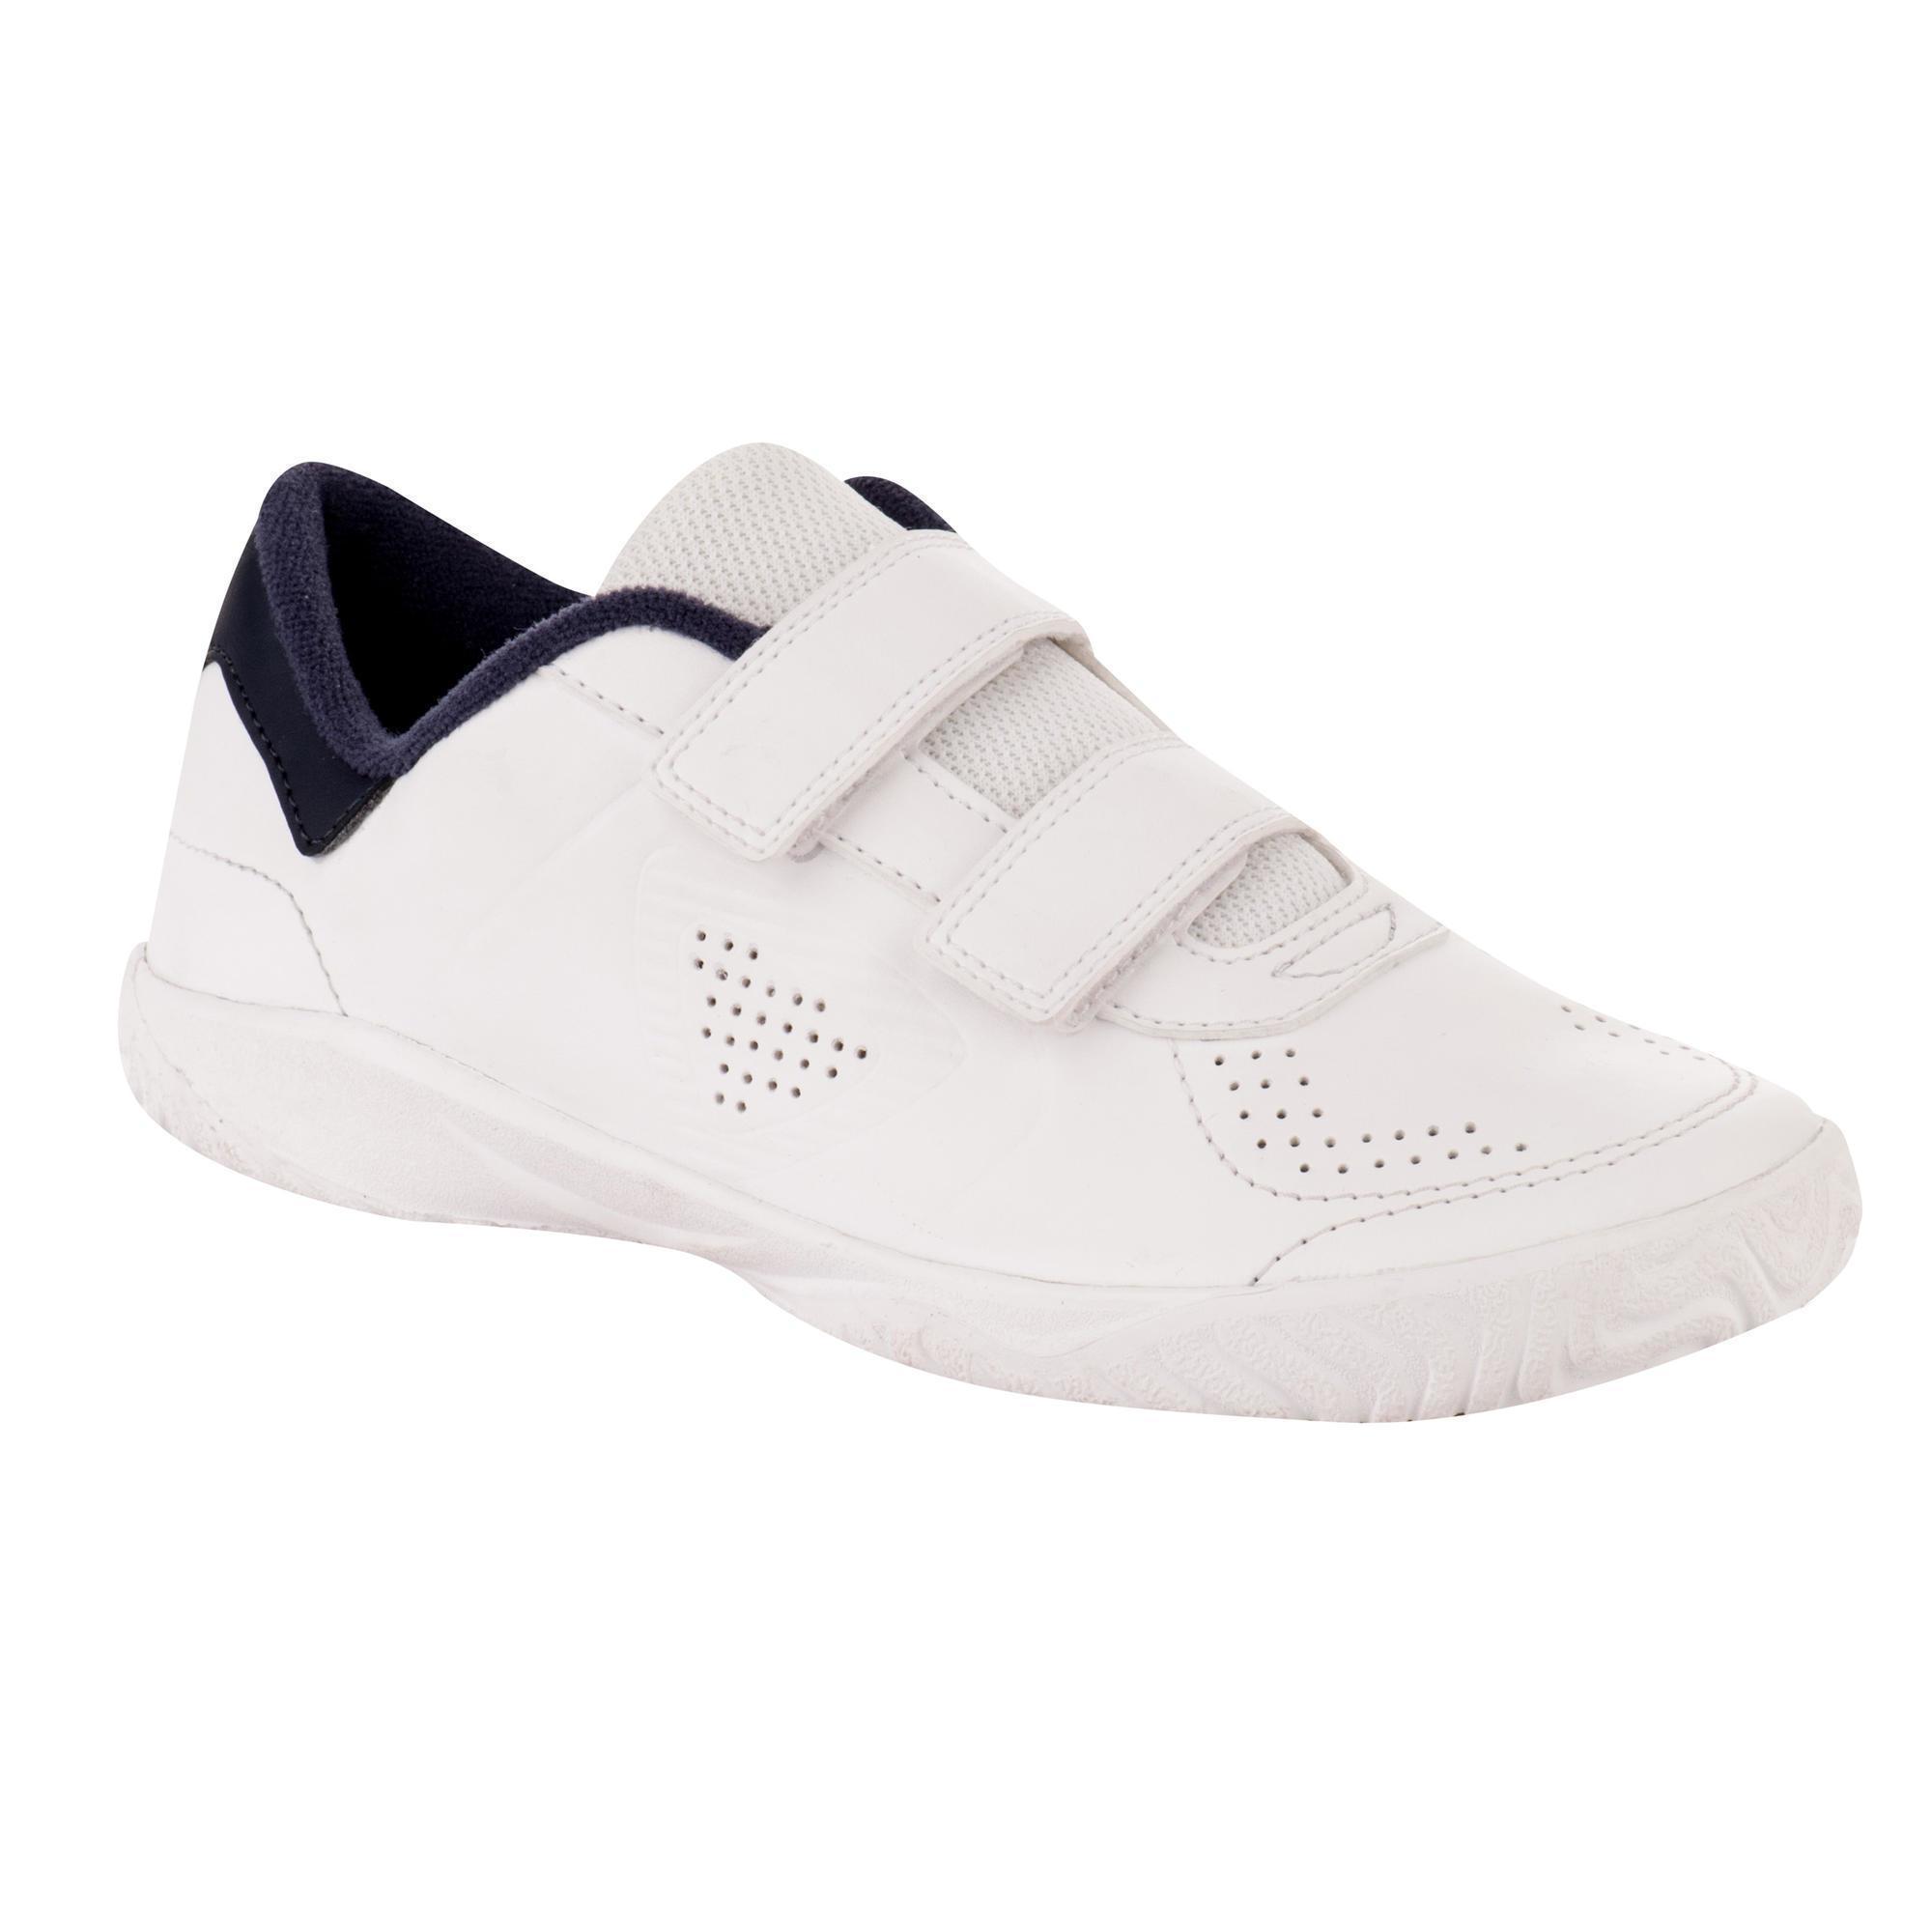 the latest fb04c 9b07b chaussure tennis artengo,CHAUSSURES TENNIS HOMME 800 BLANC BLEU ARTENGO  Chaussures